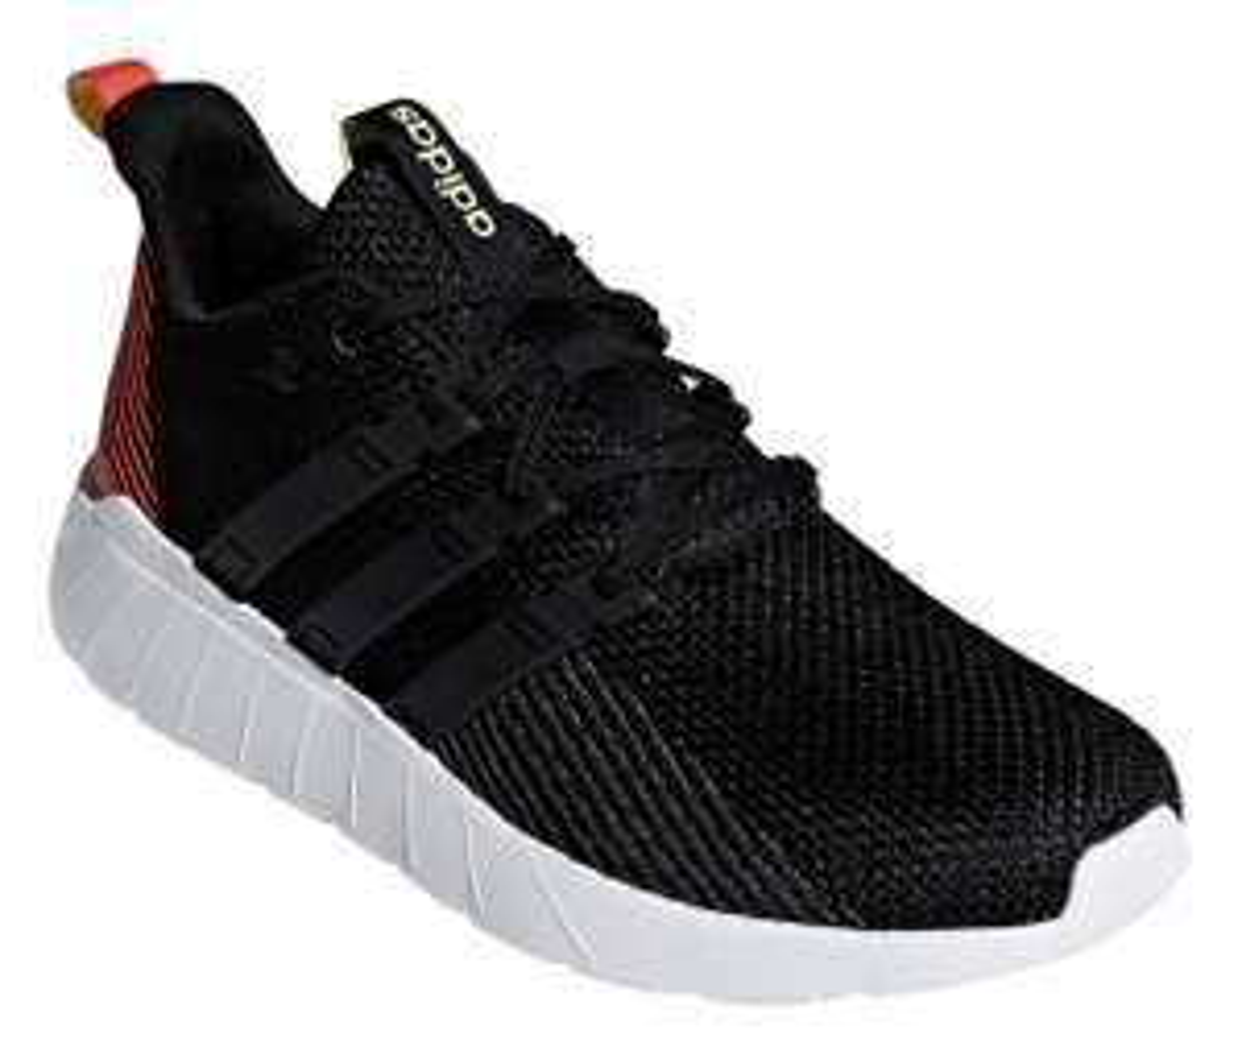 adidas Trainingsschuh Questar Flow schwarz/rot